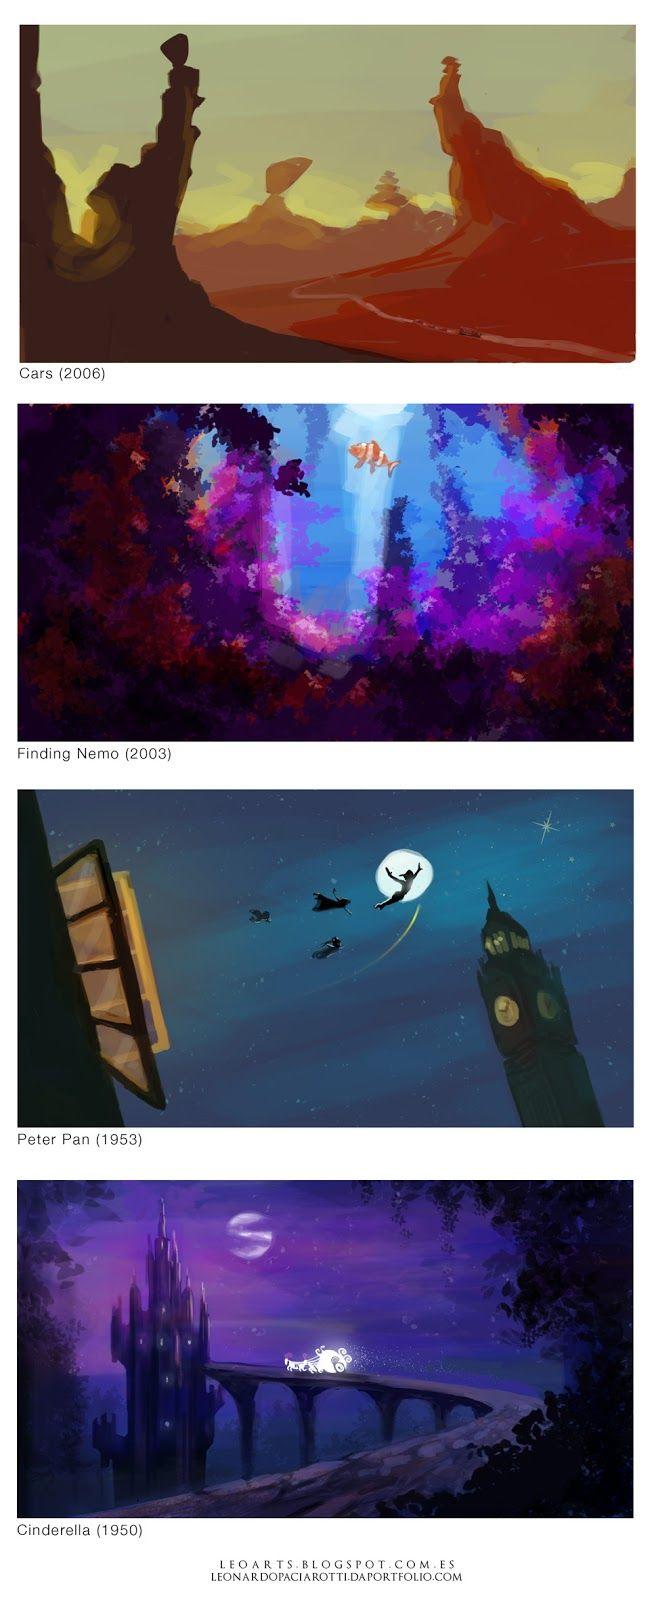 Disney Concept Art. Backgrounds.  Cars (2006),  Finding Nemo (2003),  Peter Pan (1953), Cinderella (1950).